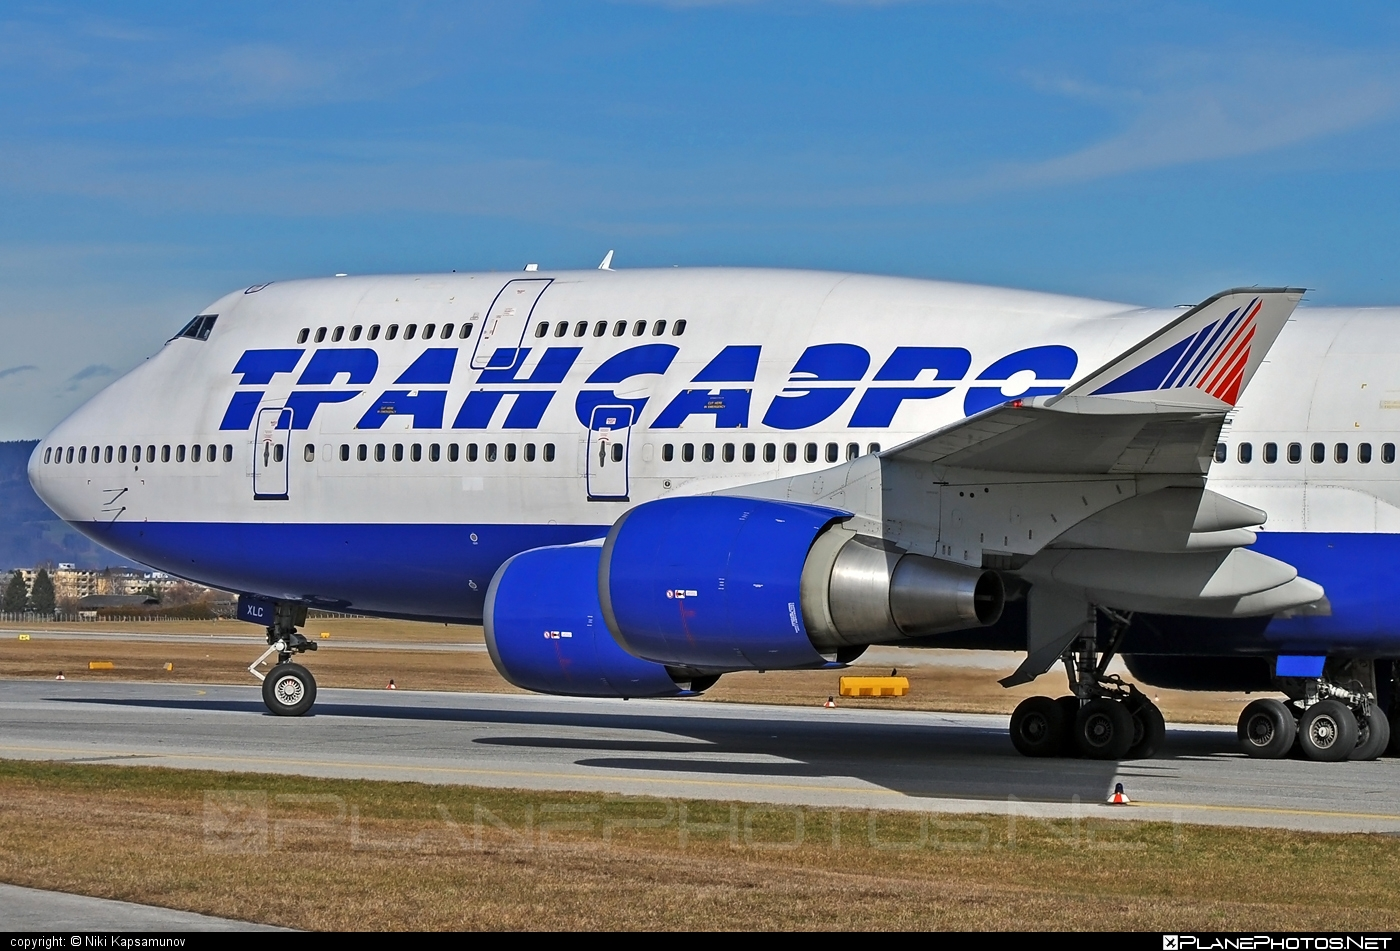 Boeing 747-400 - EI-XLC operated by Transaero Airlines #b747 #boeing #boeing747 #jumbo